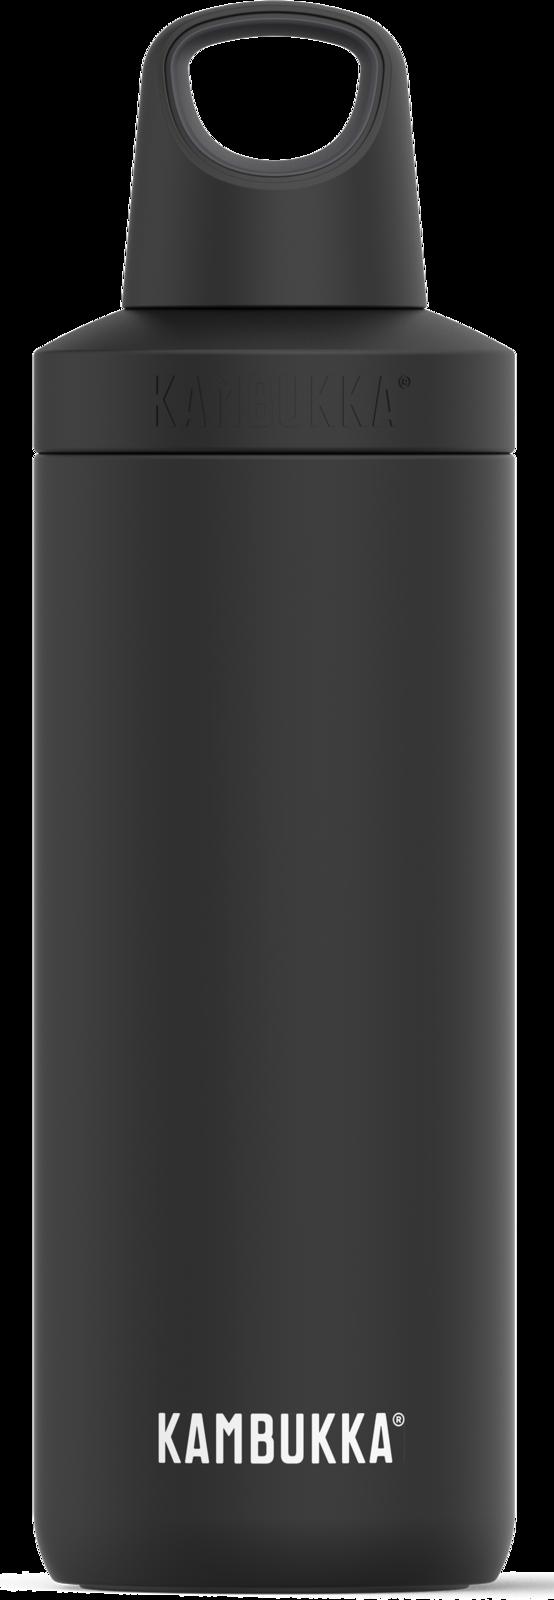 Butelka termiczna Kambukka Reno Insulated 100% Hasselt